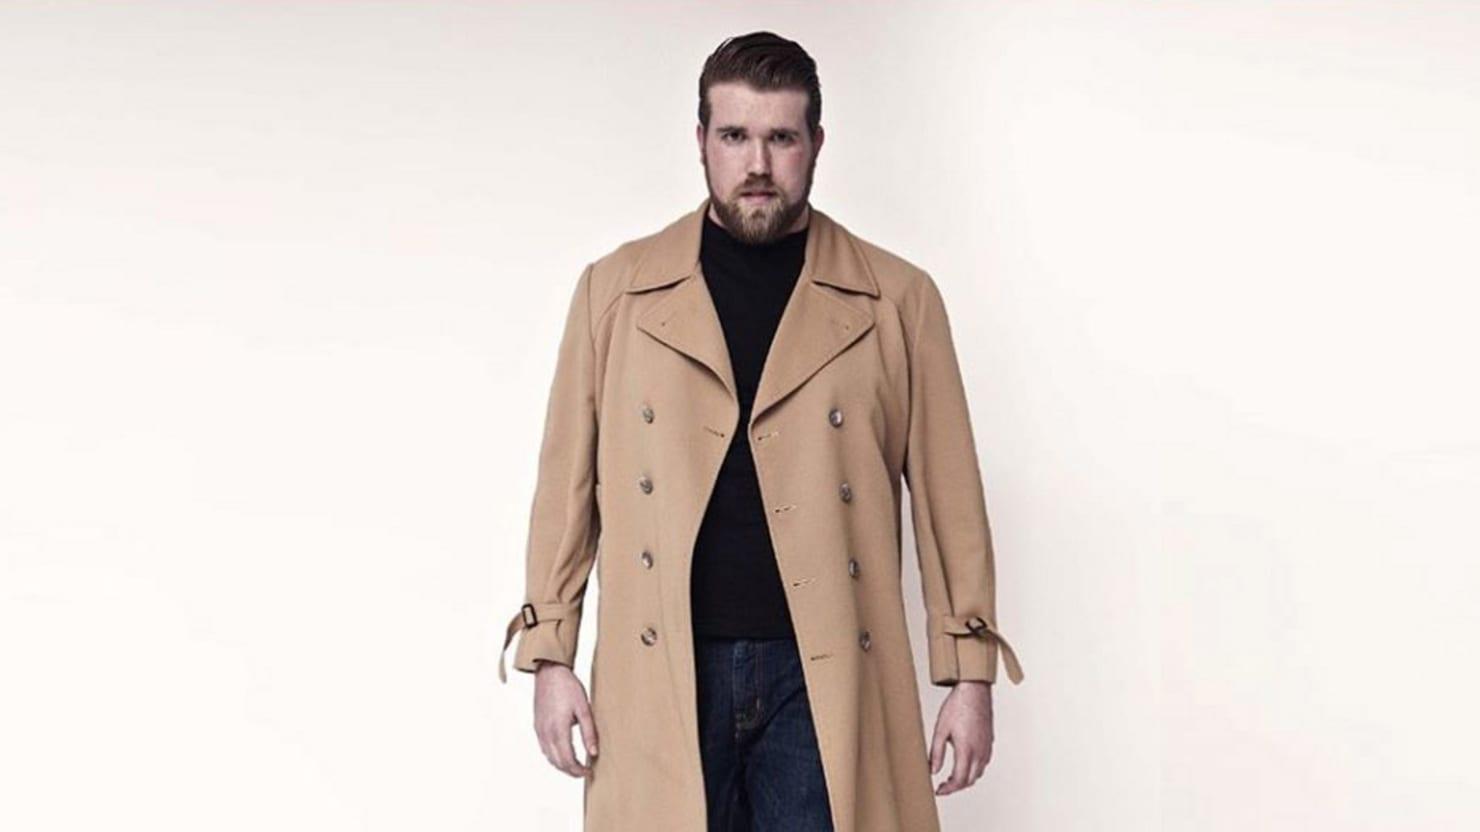 meet zach miko, the first 'brawny'—not plus-size—male model